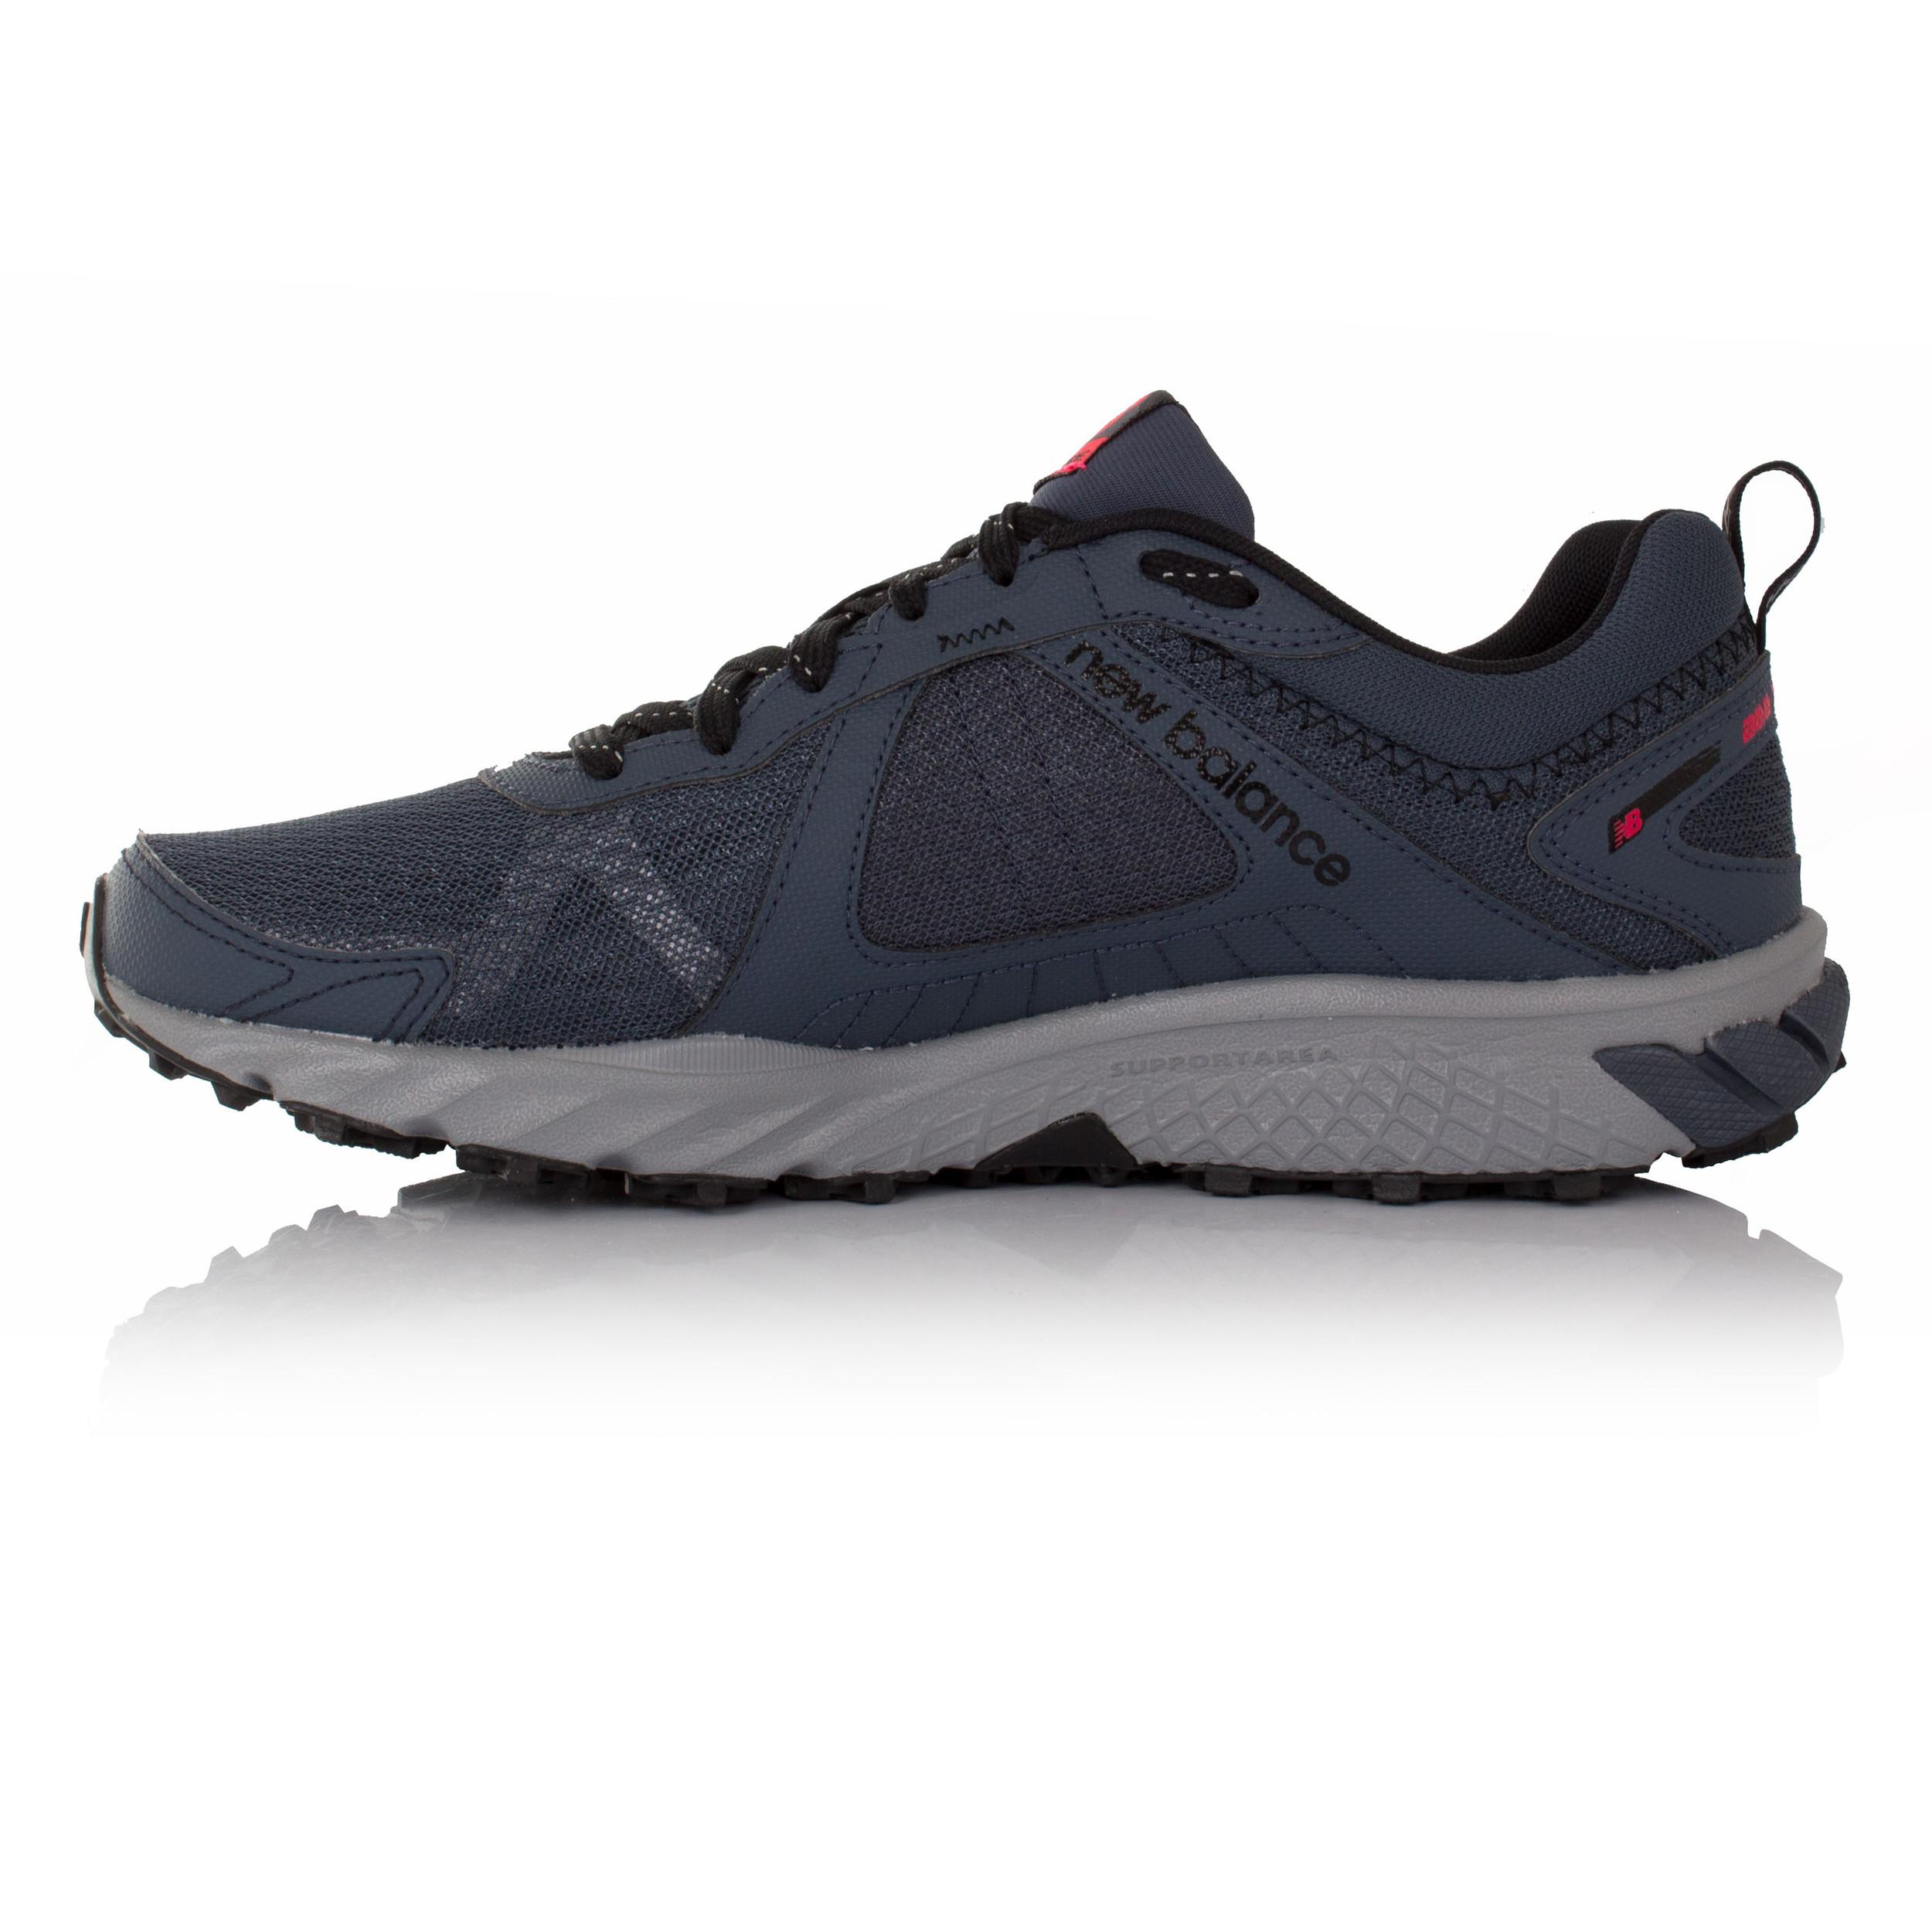 new balance mens mt610v5 trail running shoe